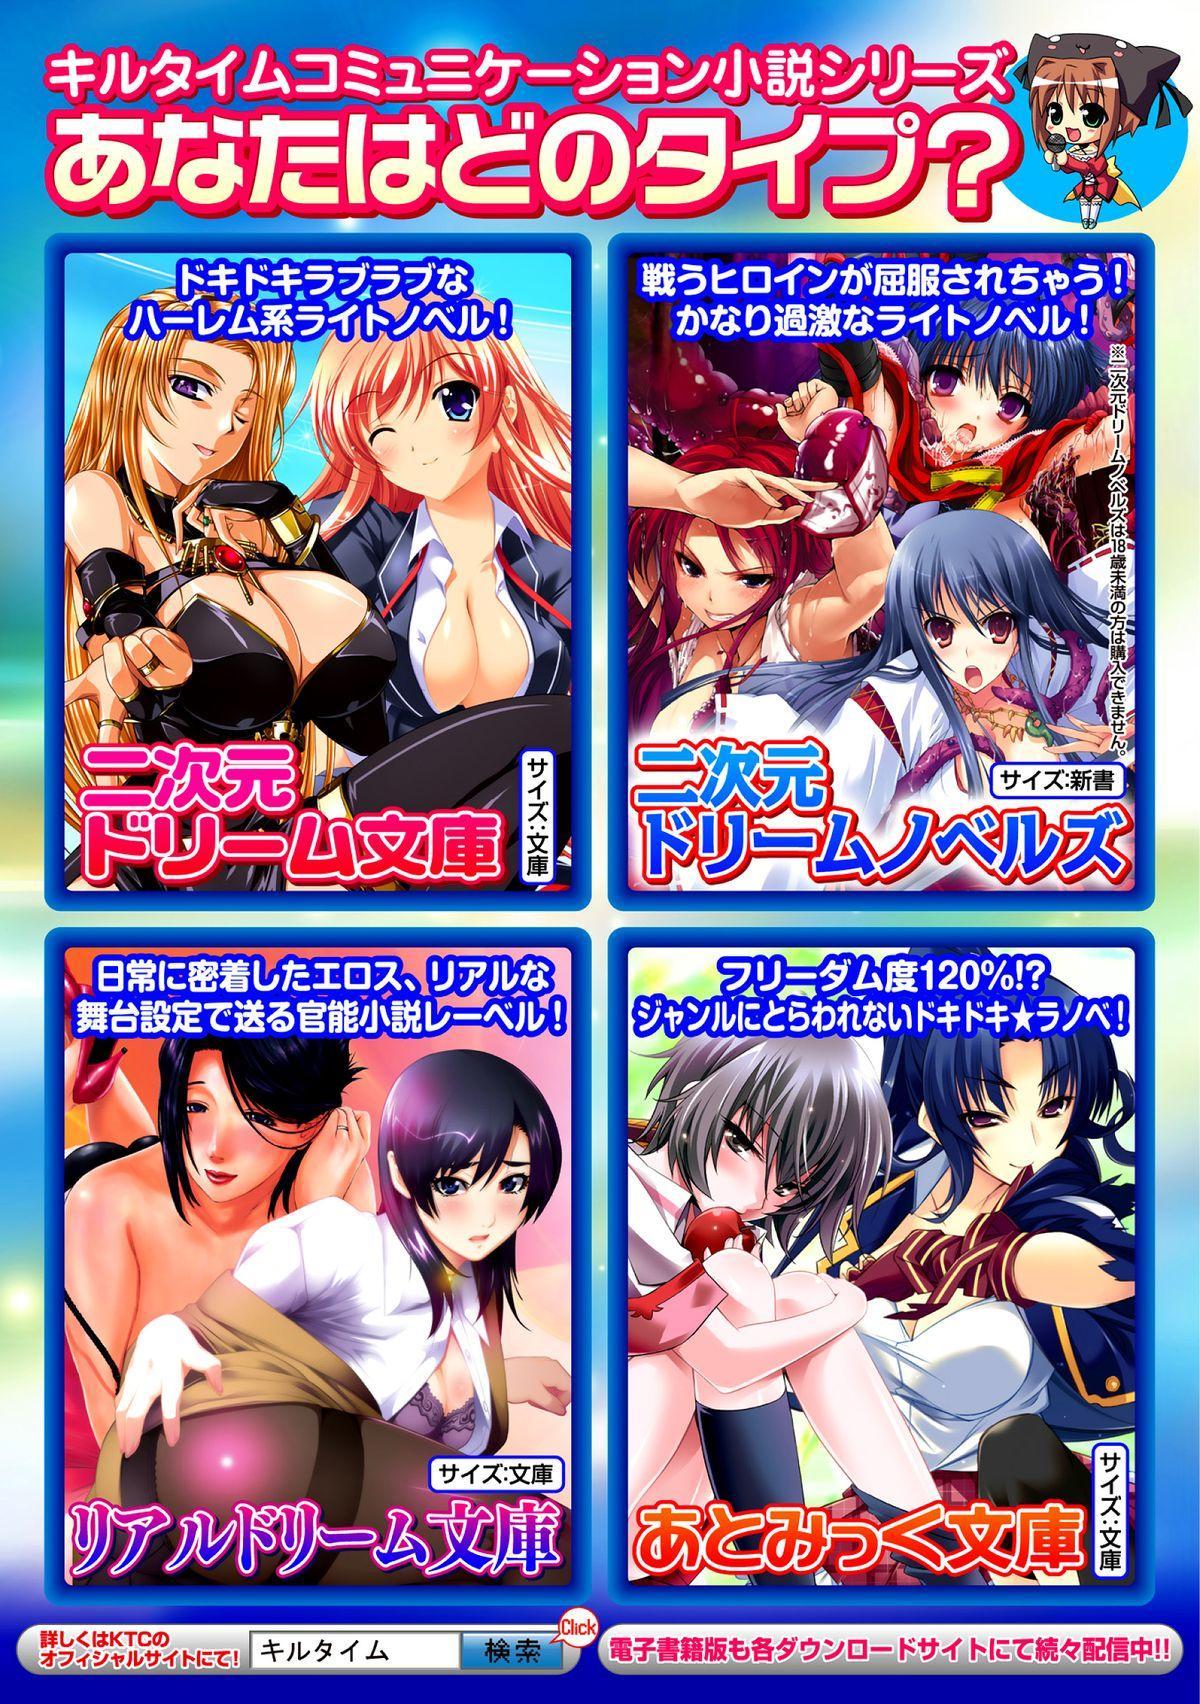 2D Comic Magazine Shokubutsukan de Monzetsu Acme Saki! Vol. 2 67